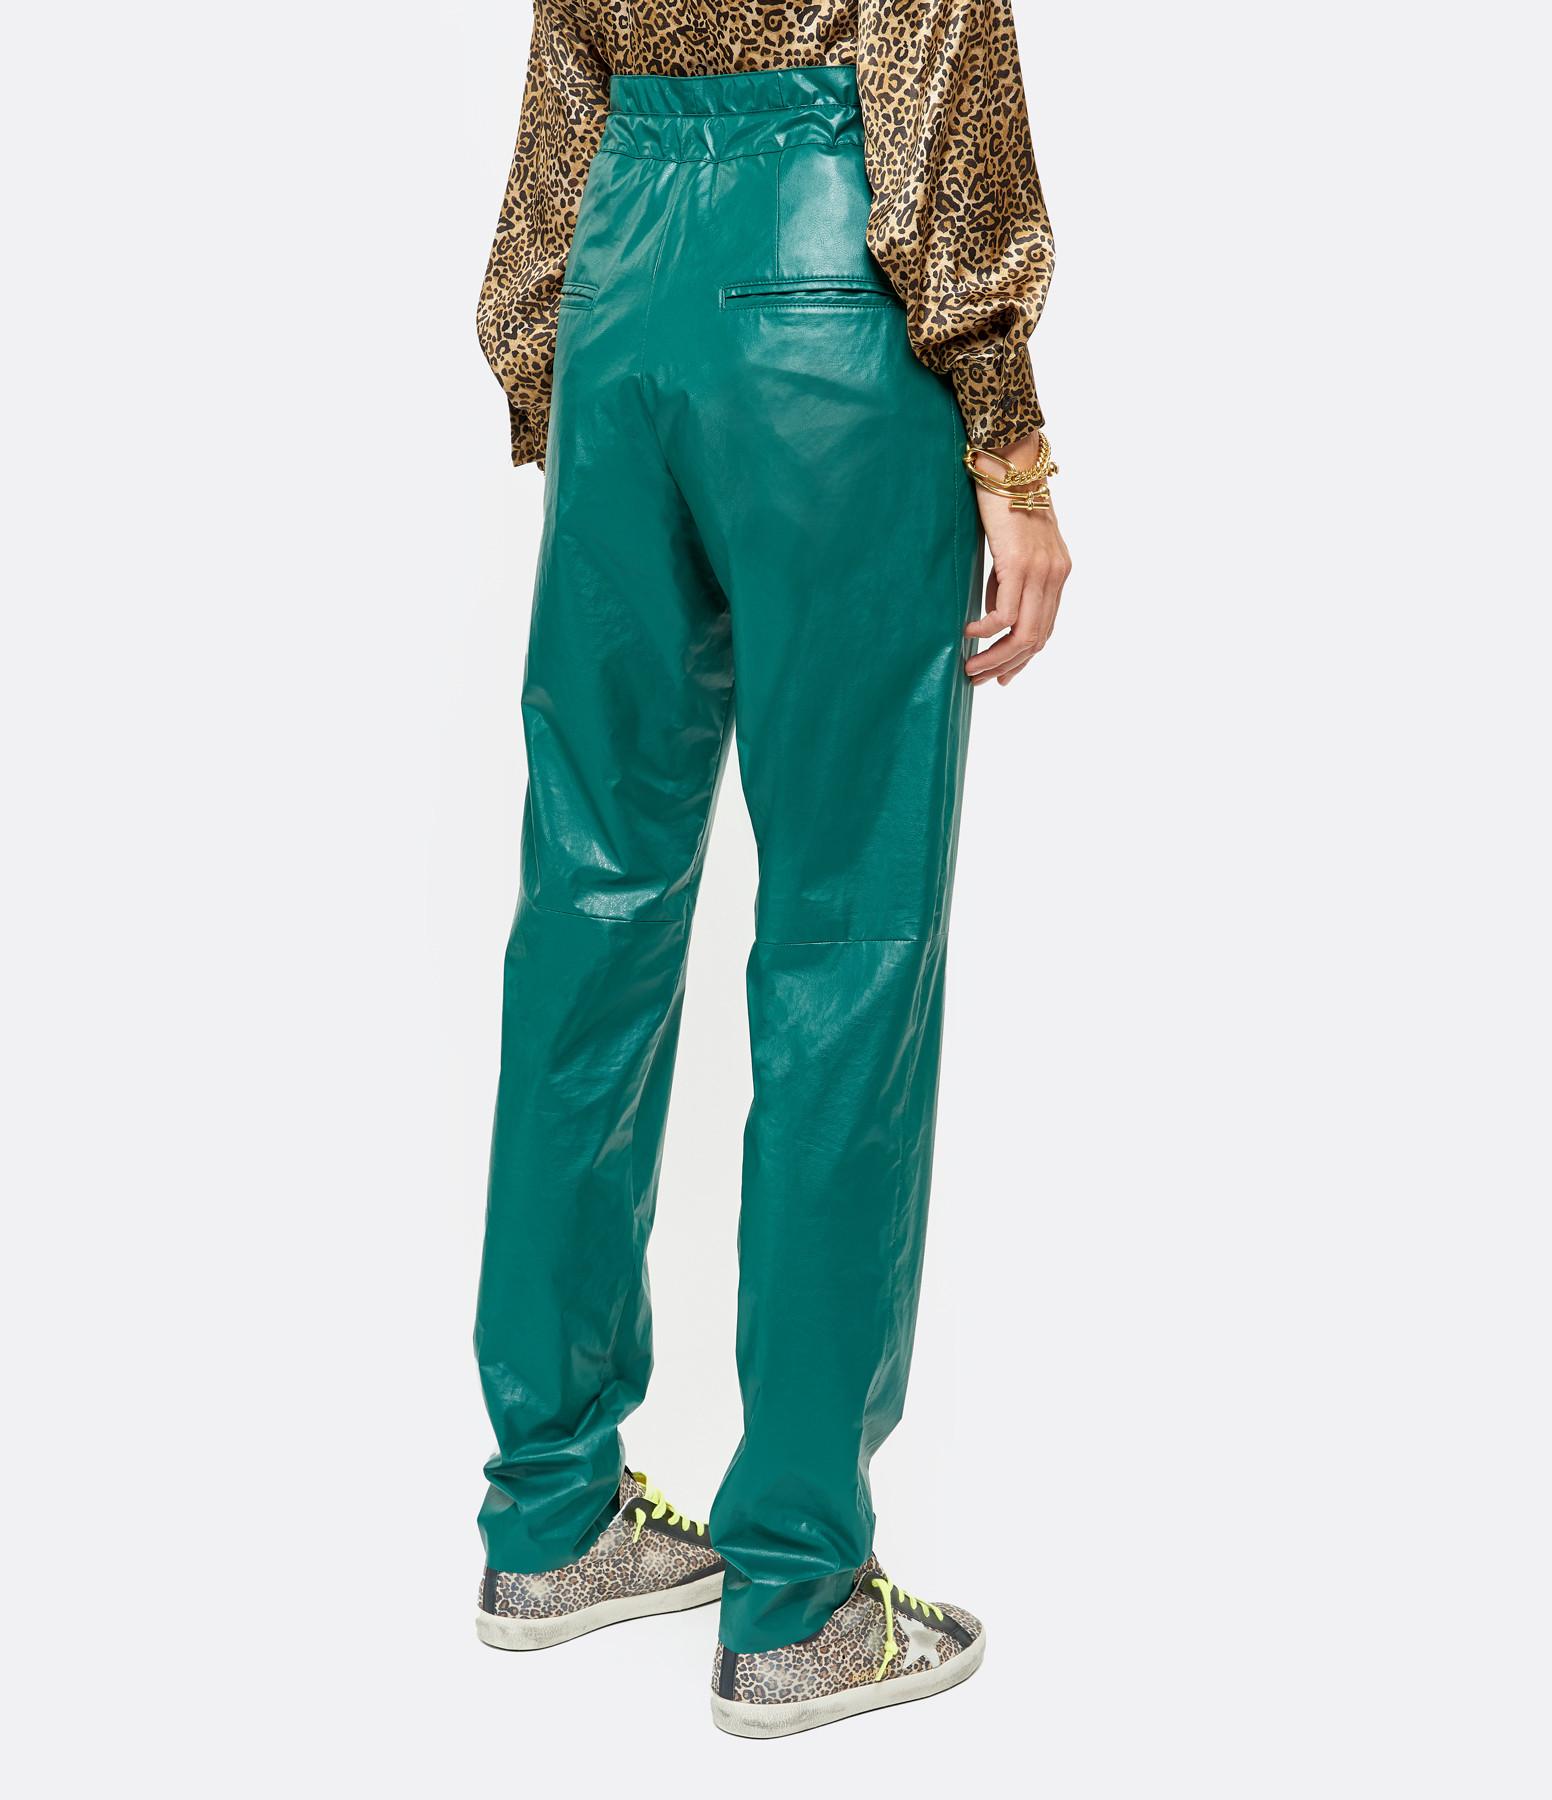 ISABEL MARANT - Pantalon Duard Vert Émeraude